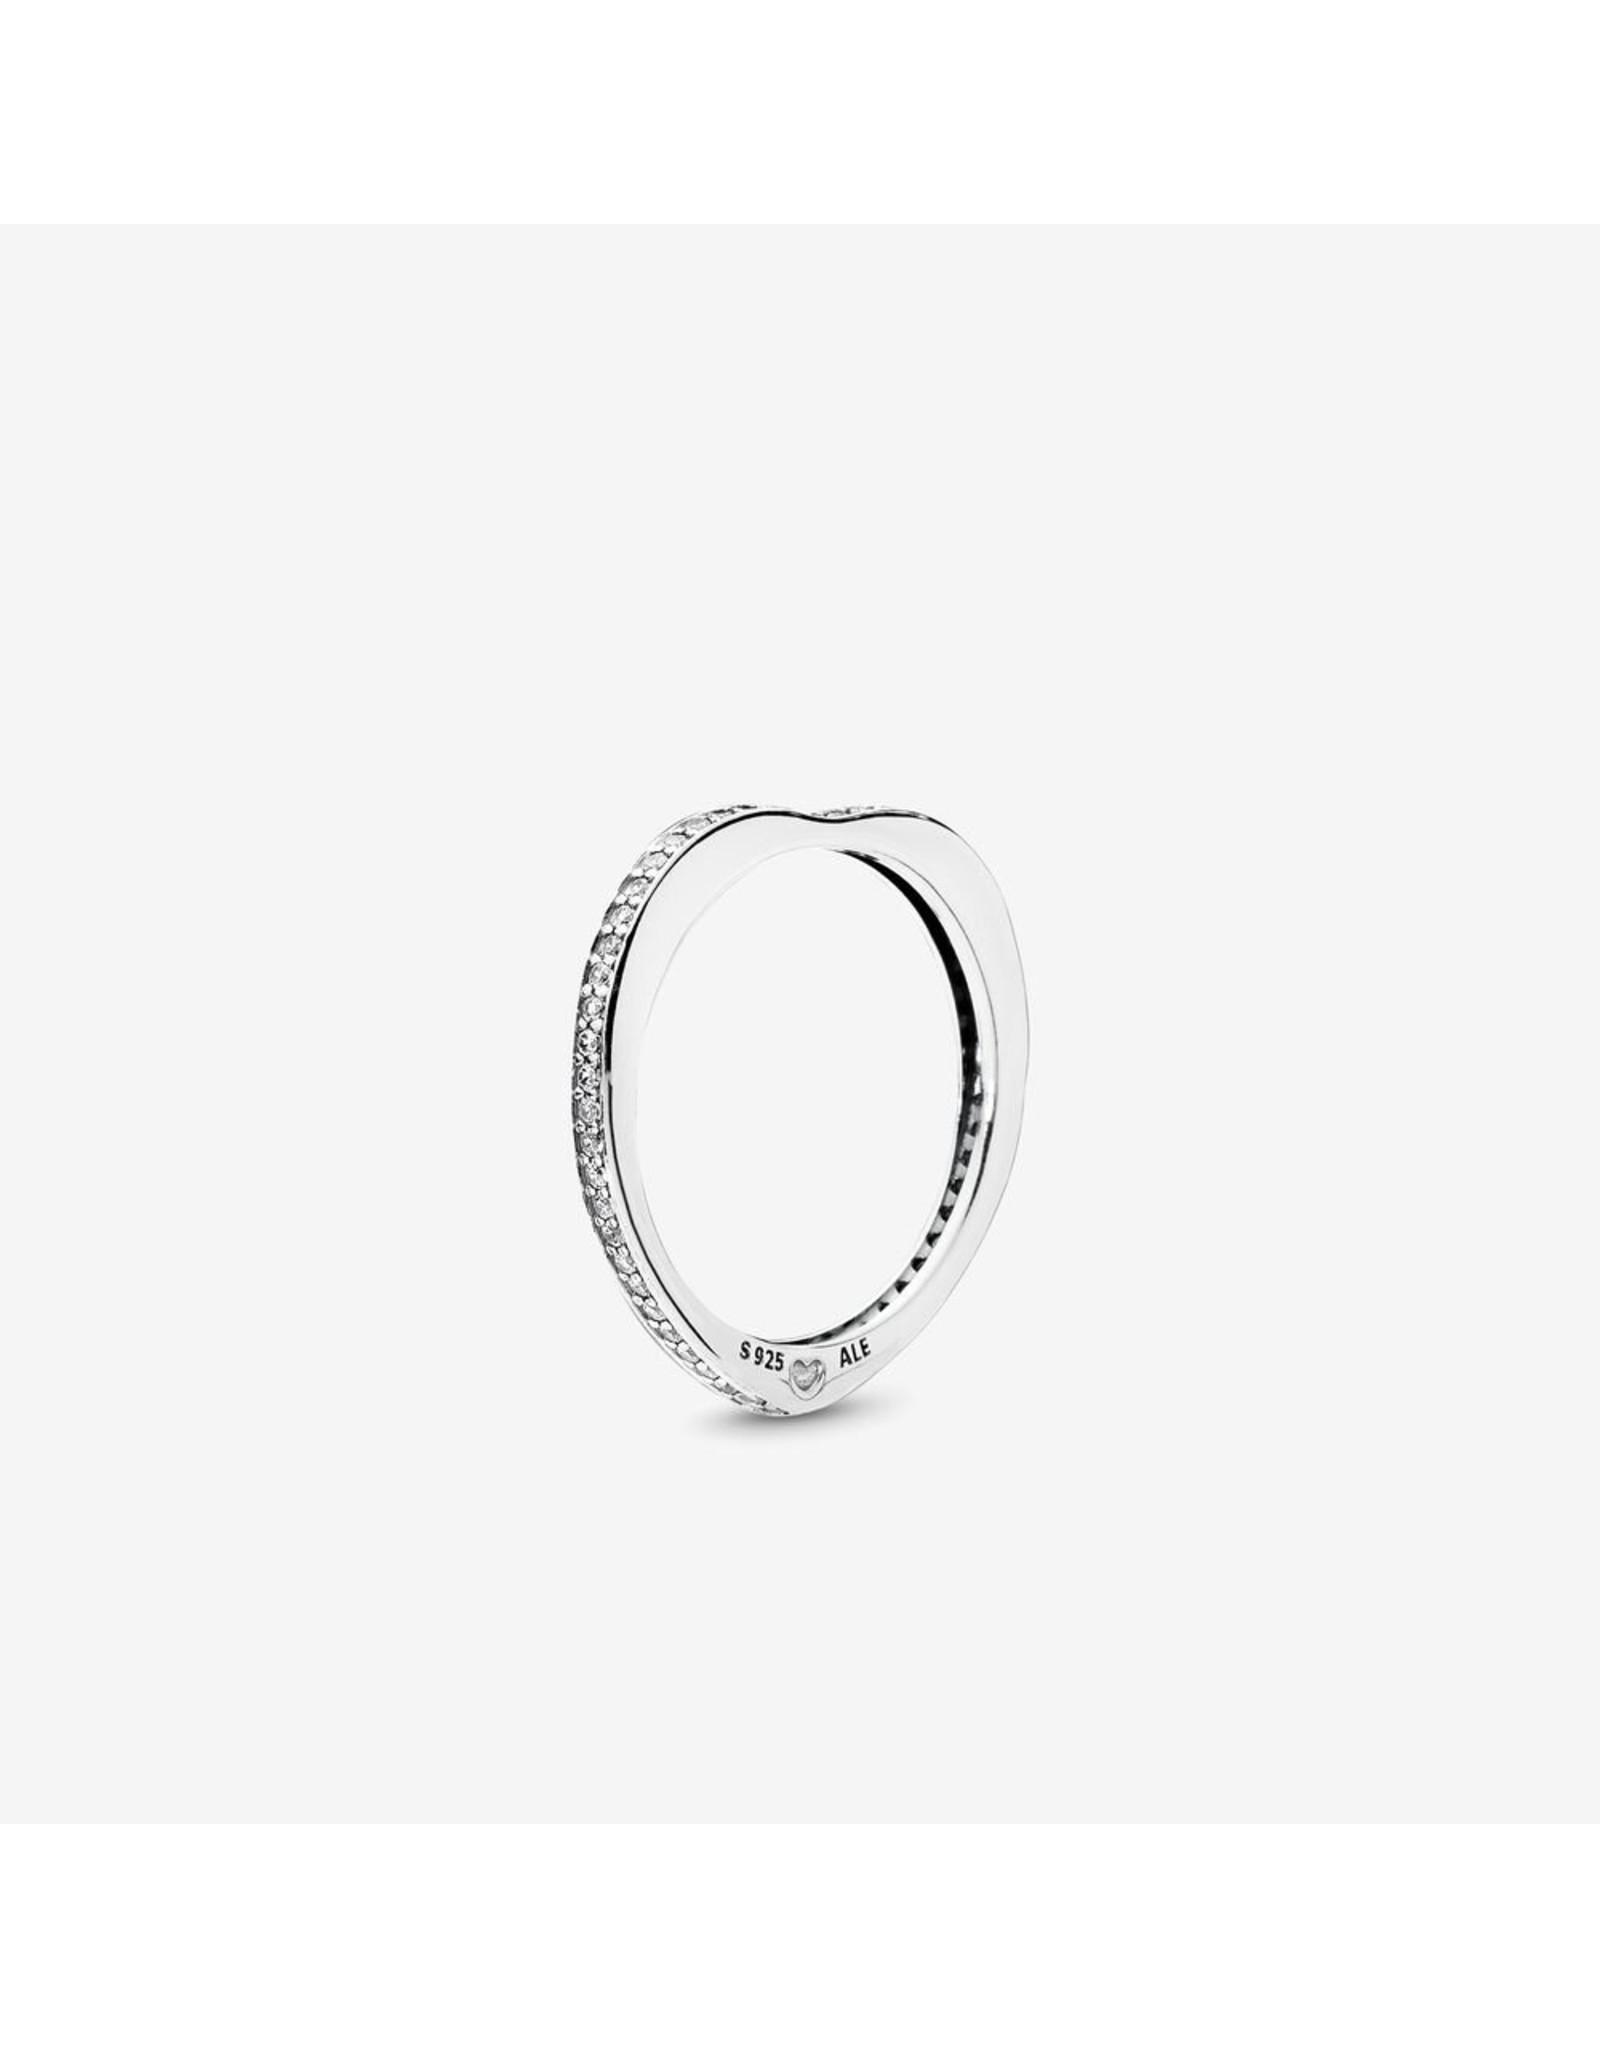 Pandora Pandora Ring, Limited Edition Arc of Love Ring